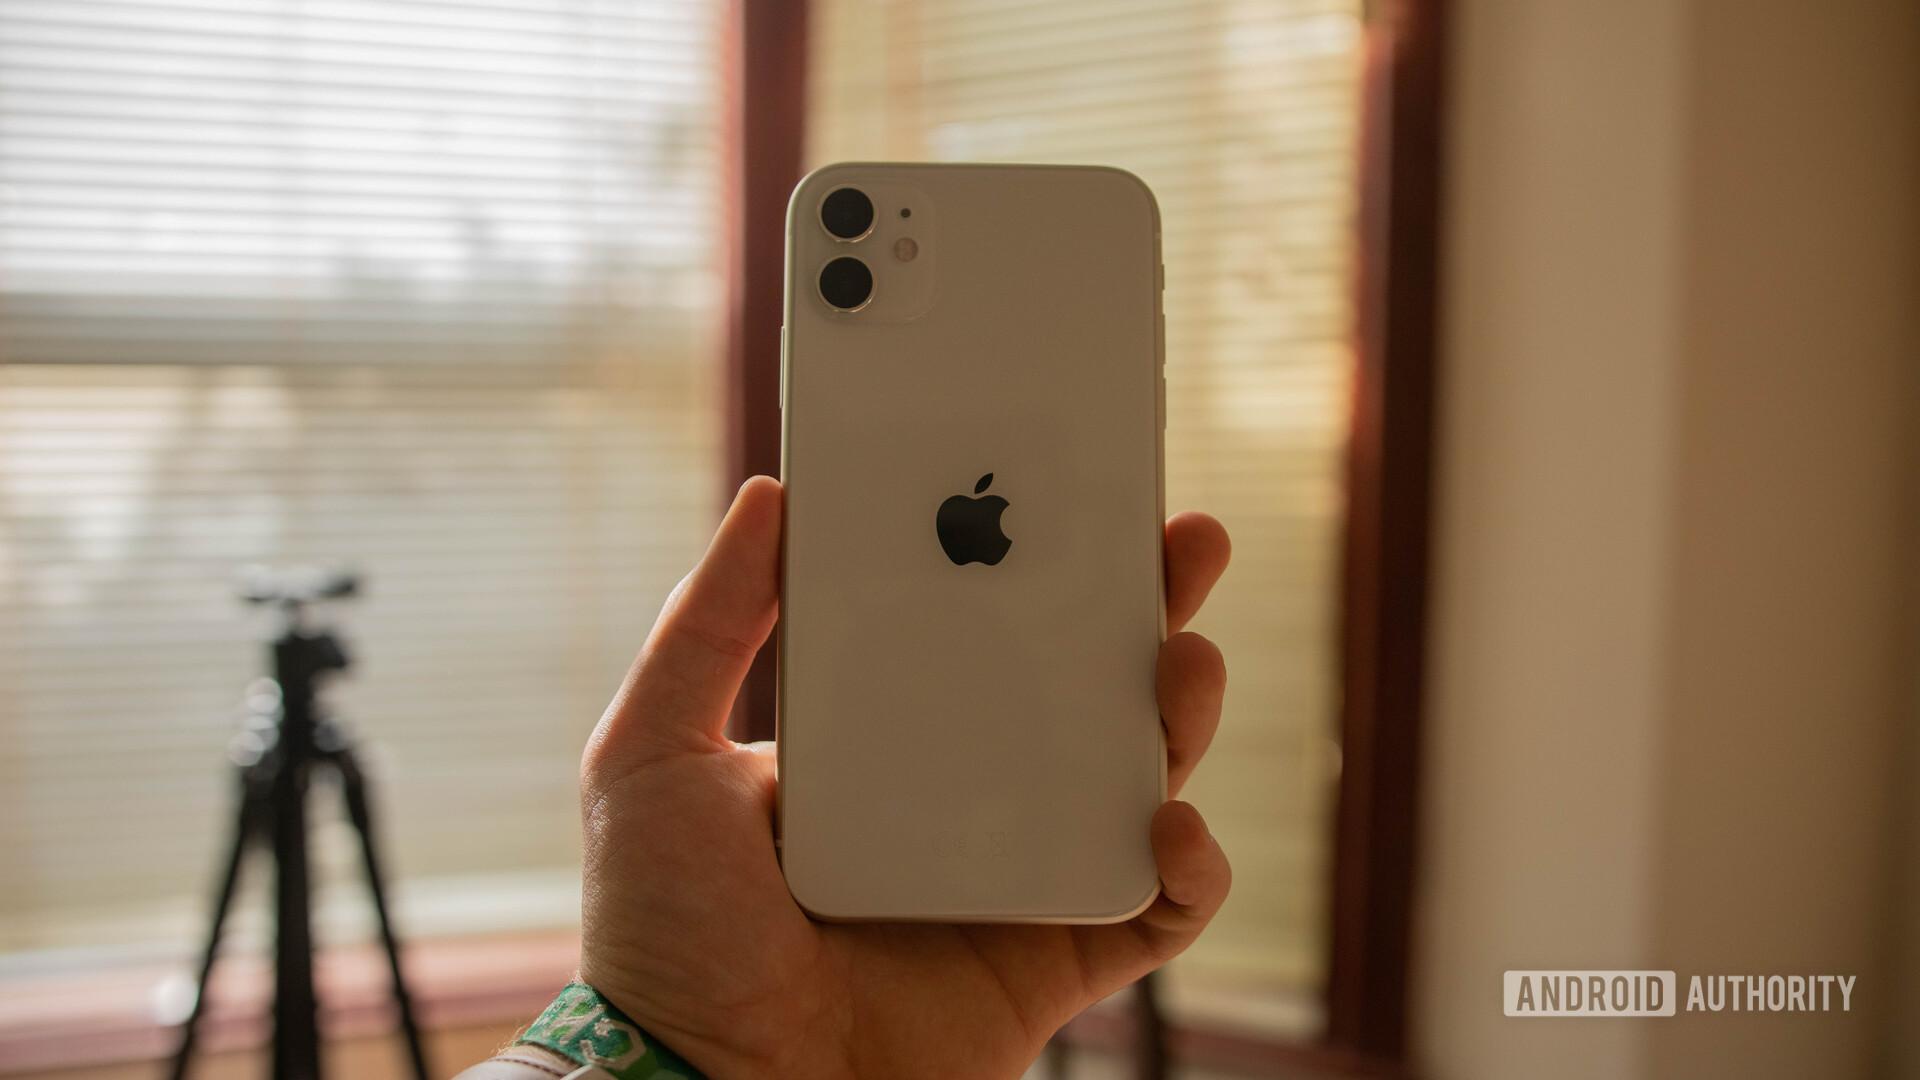 iphone 11 rear 2